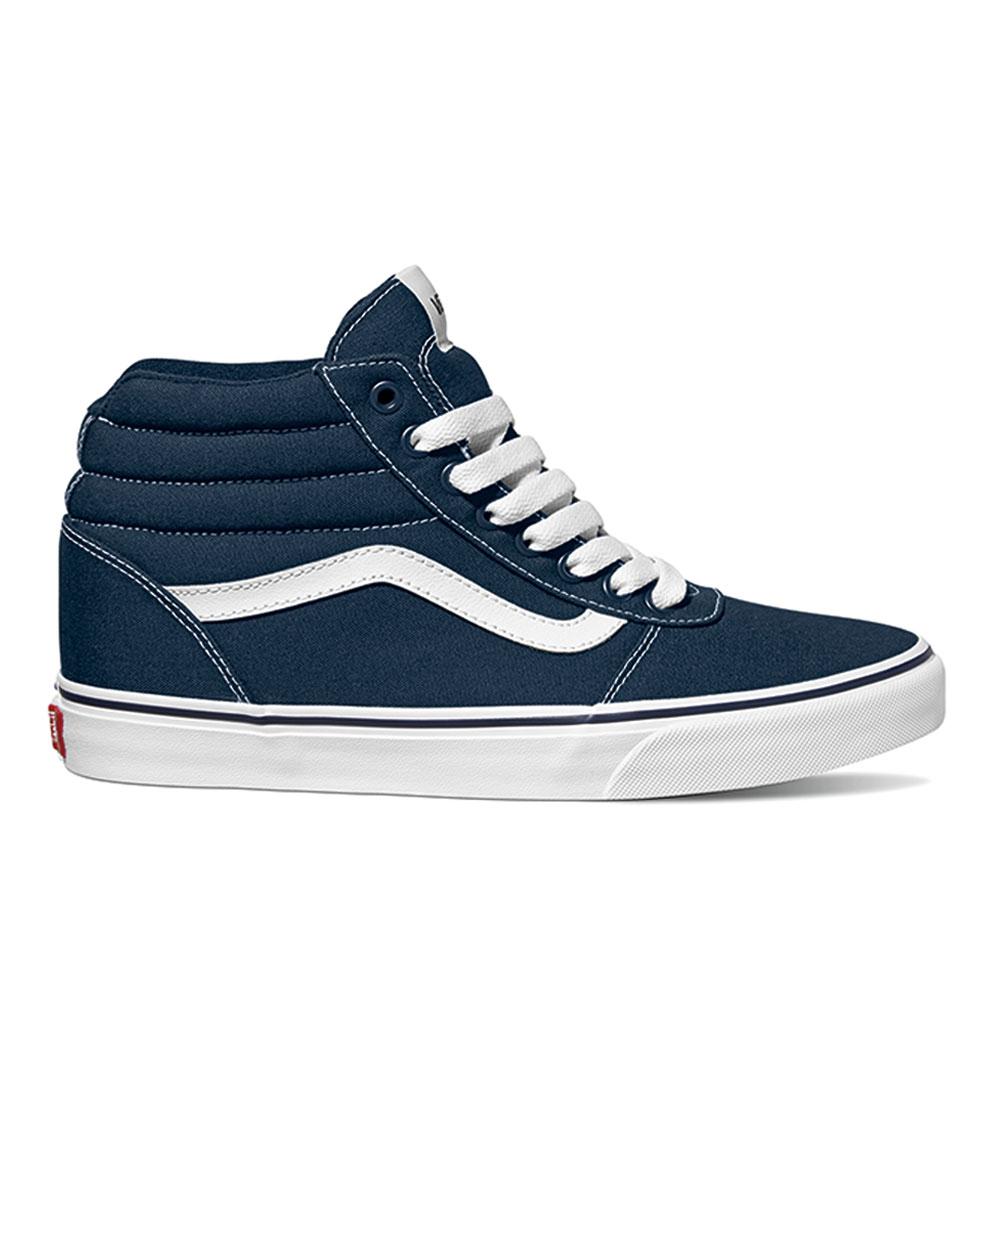 Vans Canvas Ward Hi (dress blue/white